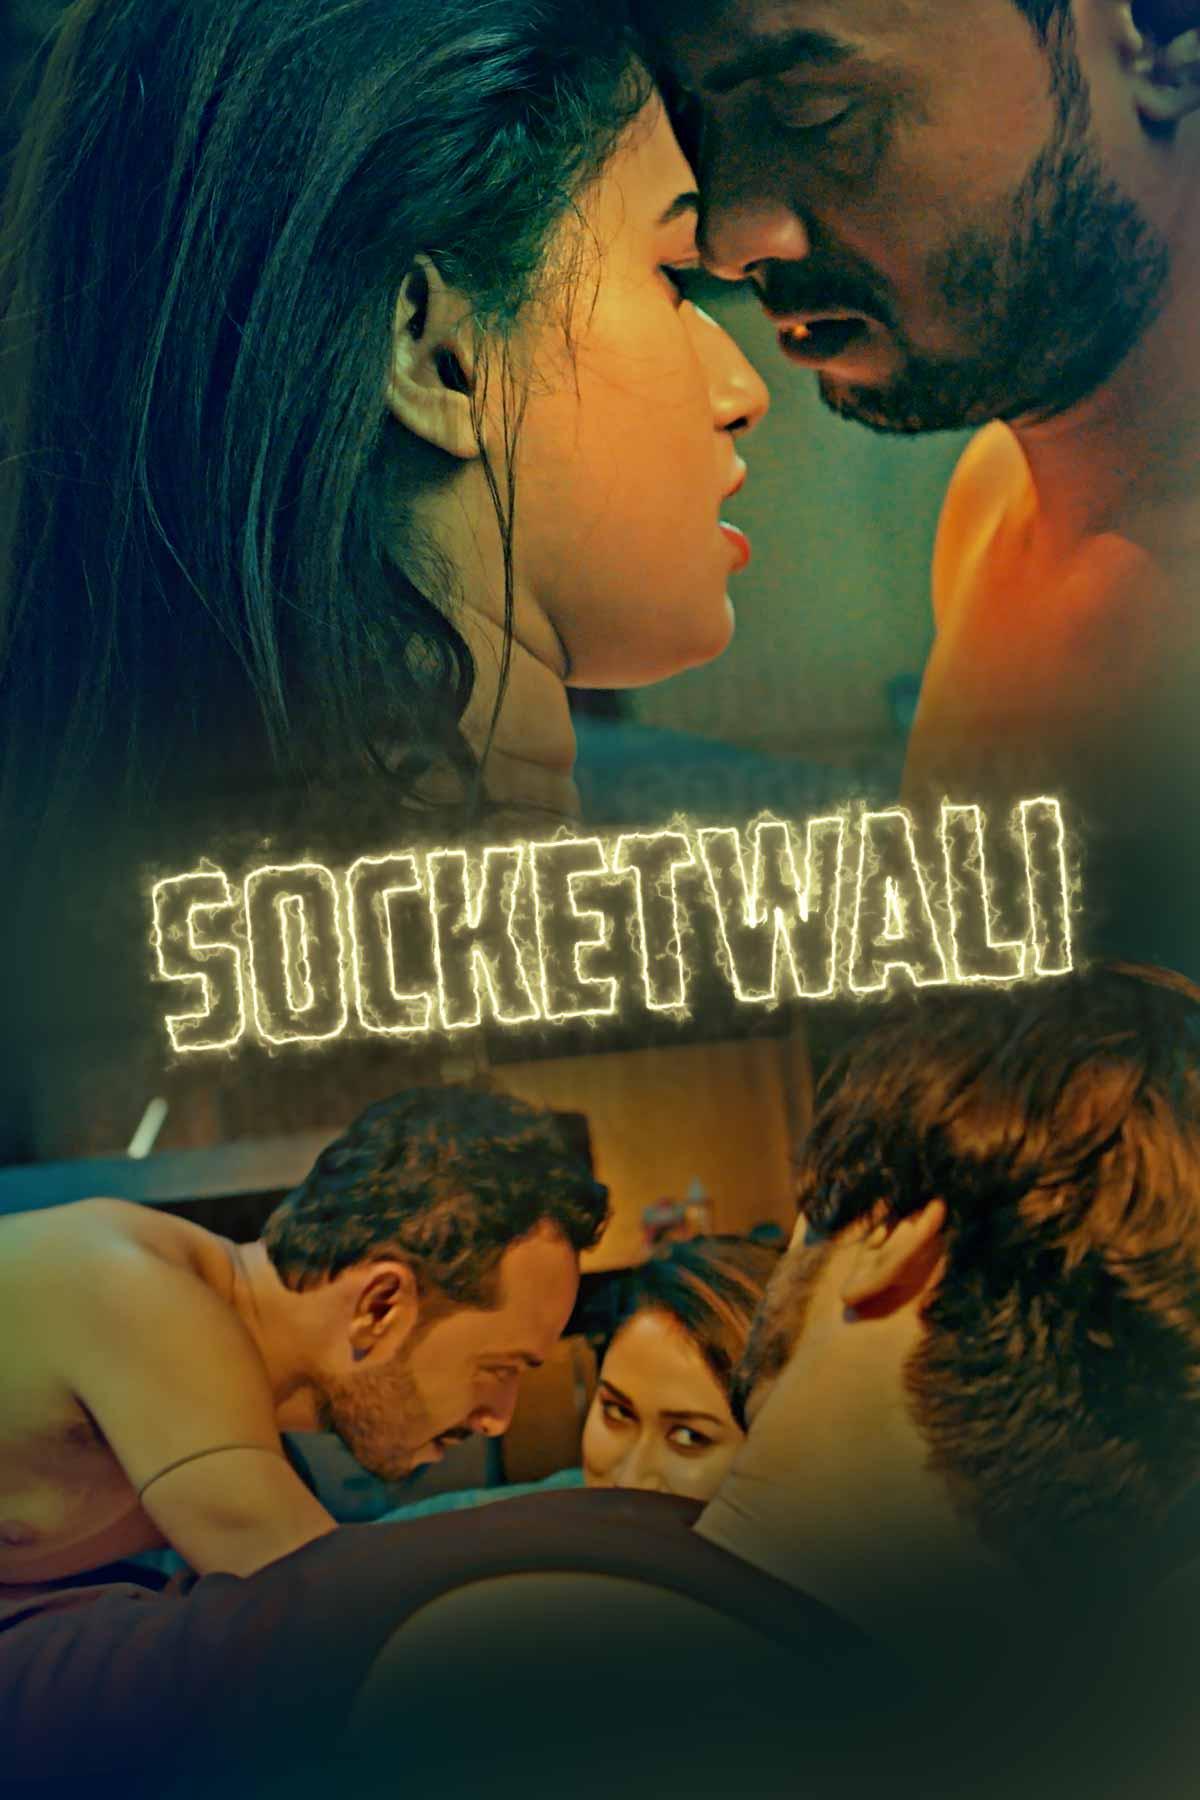 SocketWali 2021 S01 Hindi Complete Kooku App Web Series 720p HDRip 350MB Free Download